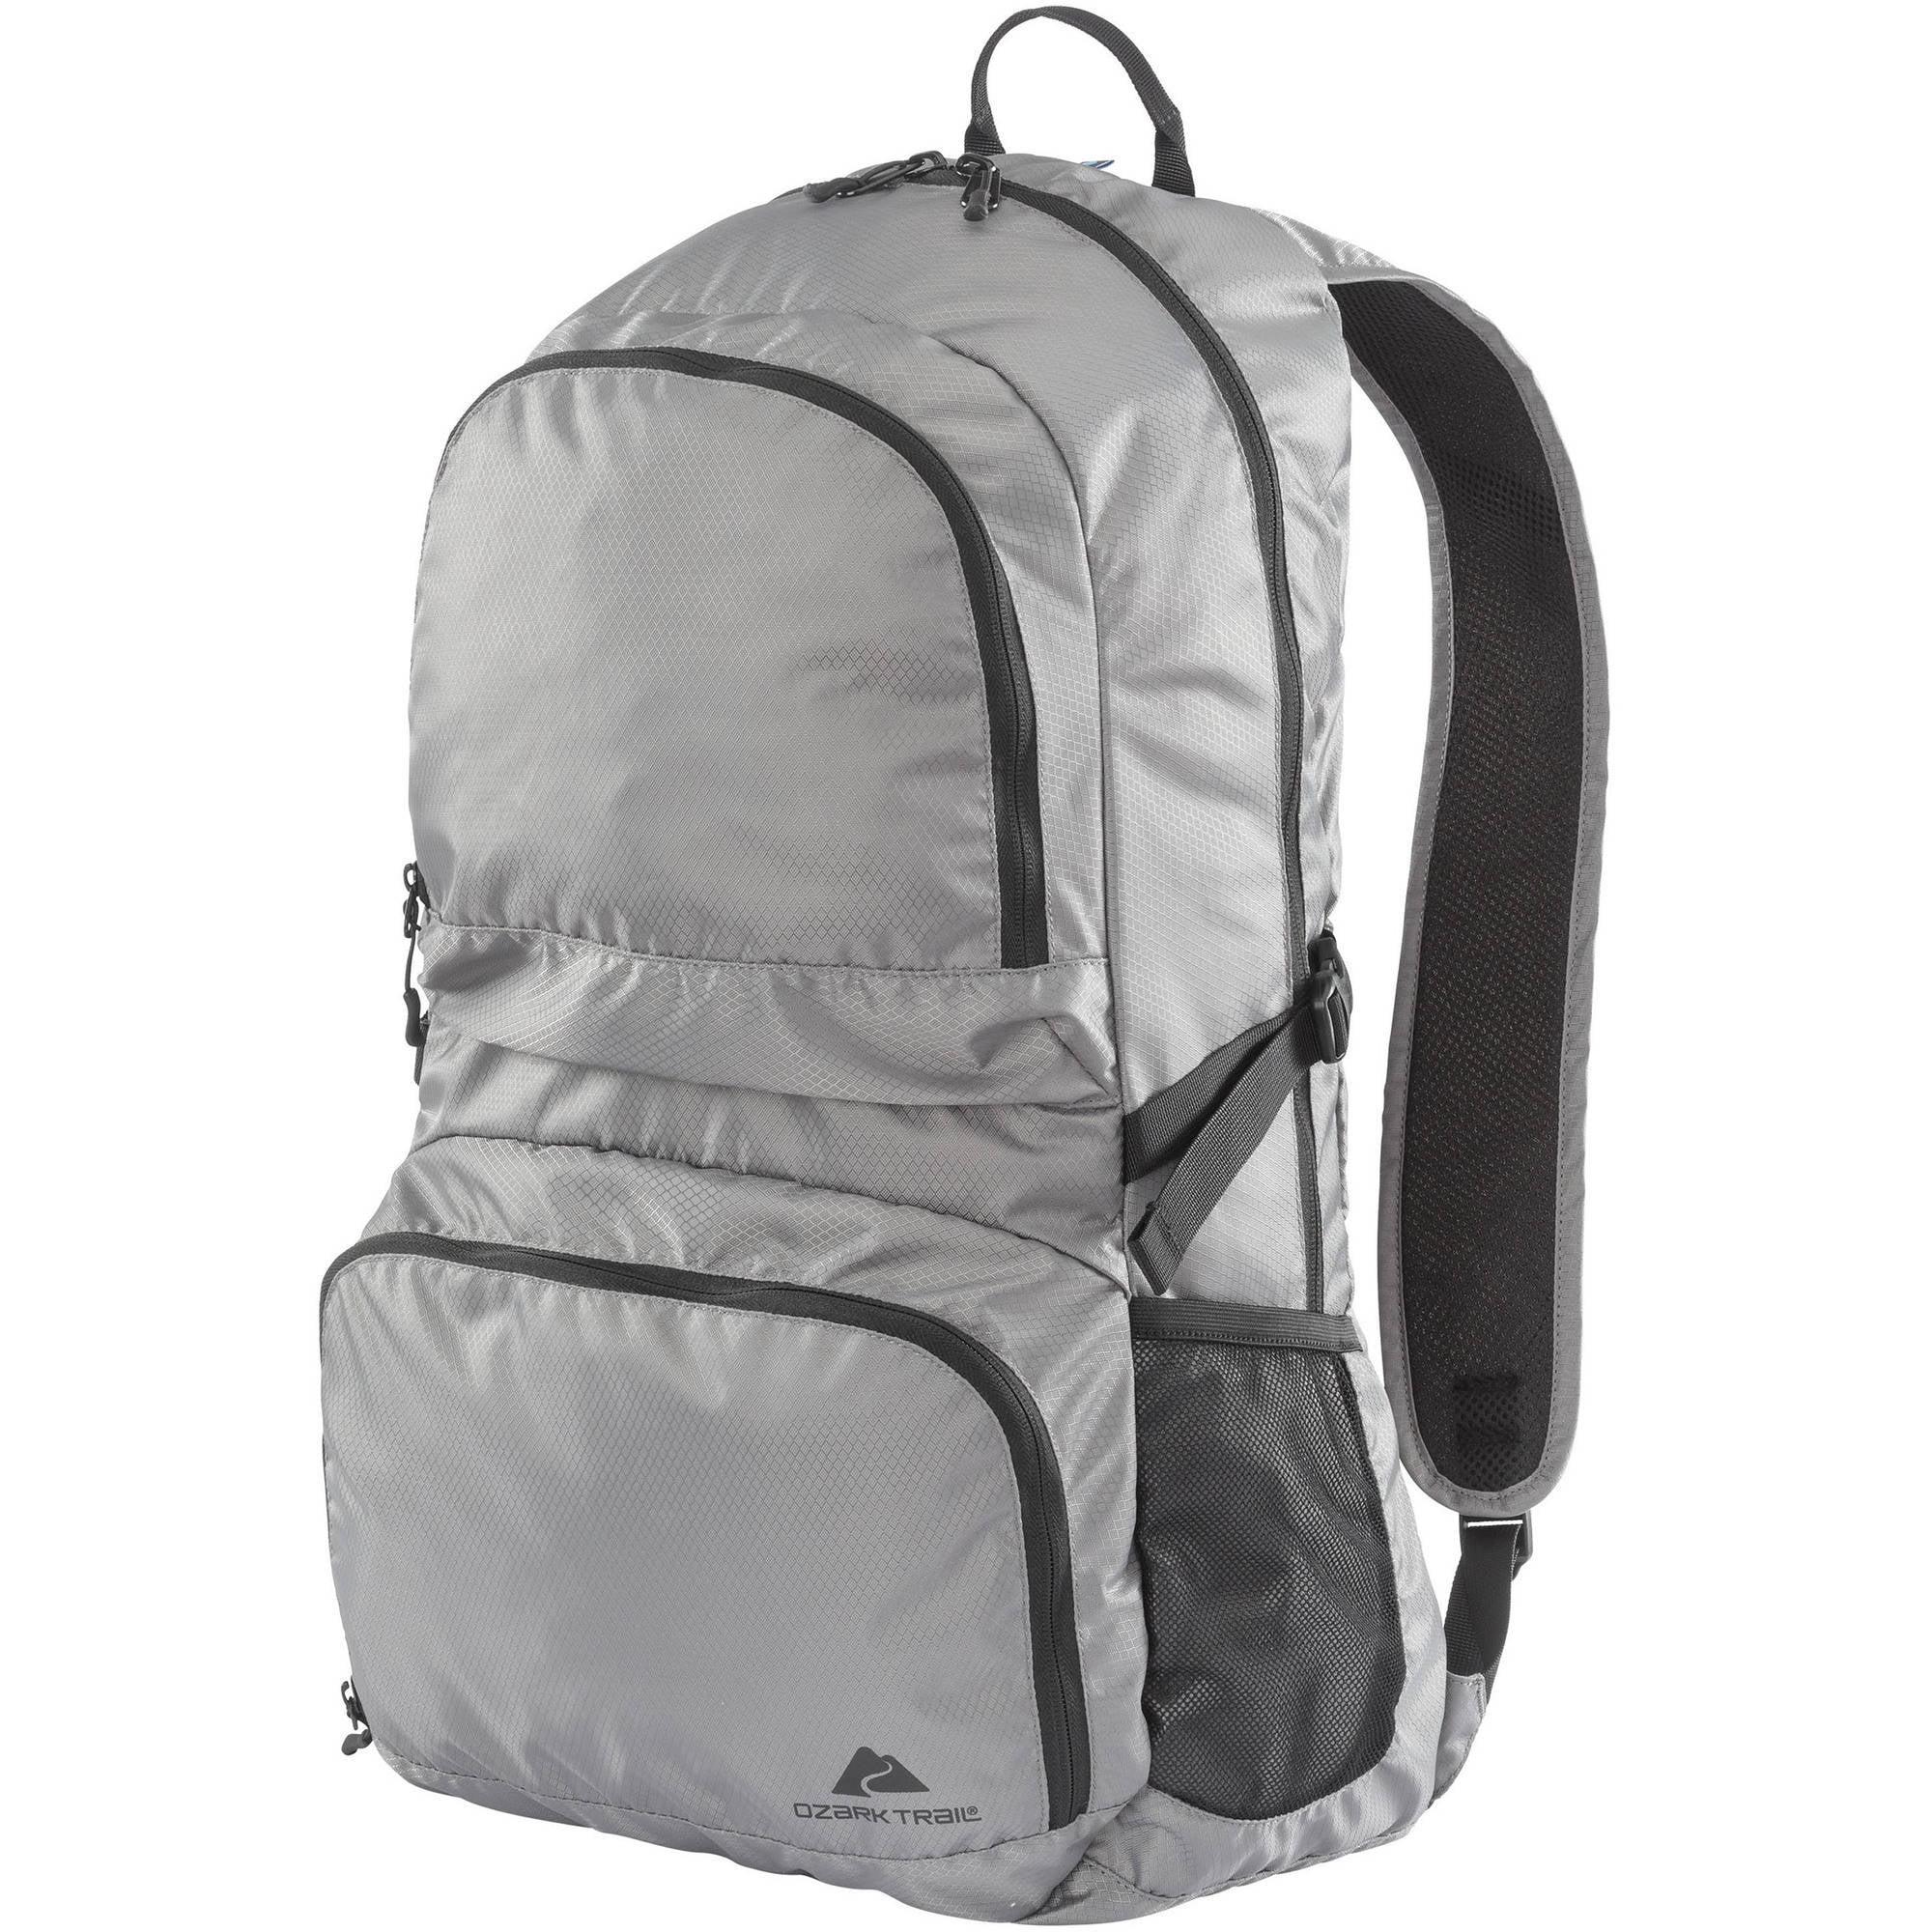 Ozark Trail Stuffable Backpack